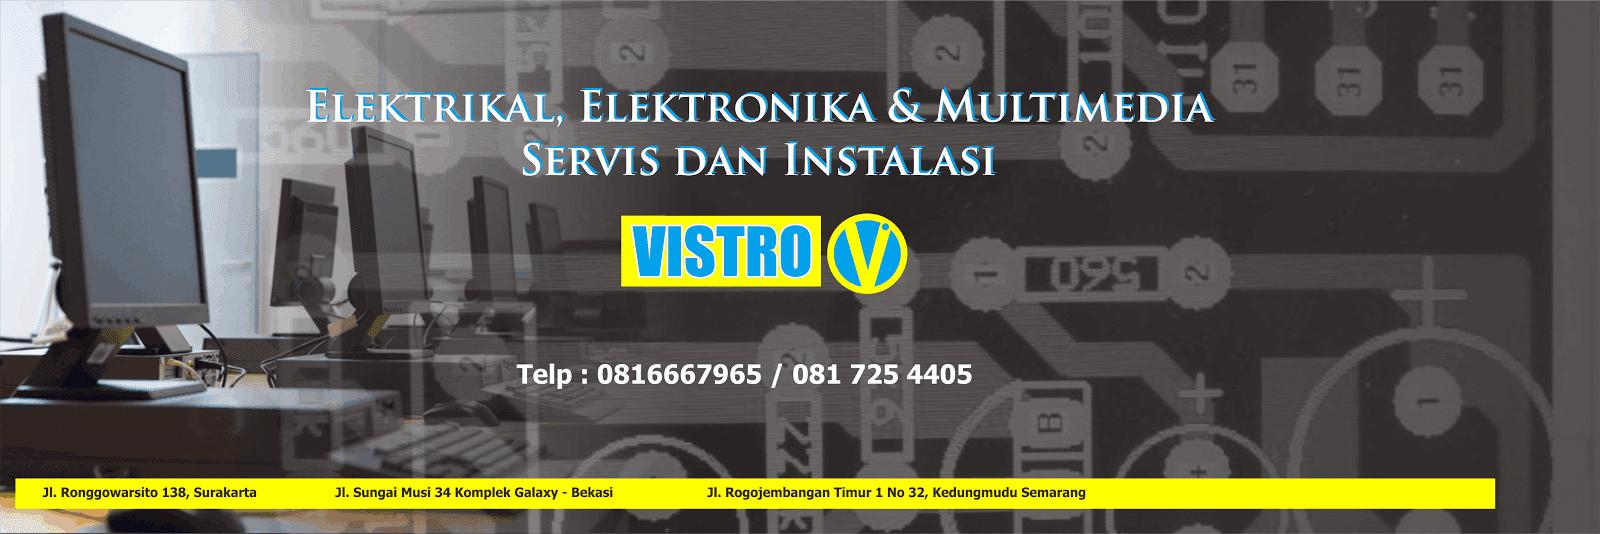 Jasa Instalasi | Service | Electrical | Elektronika | Automasi